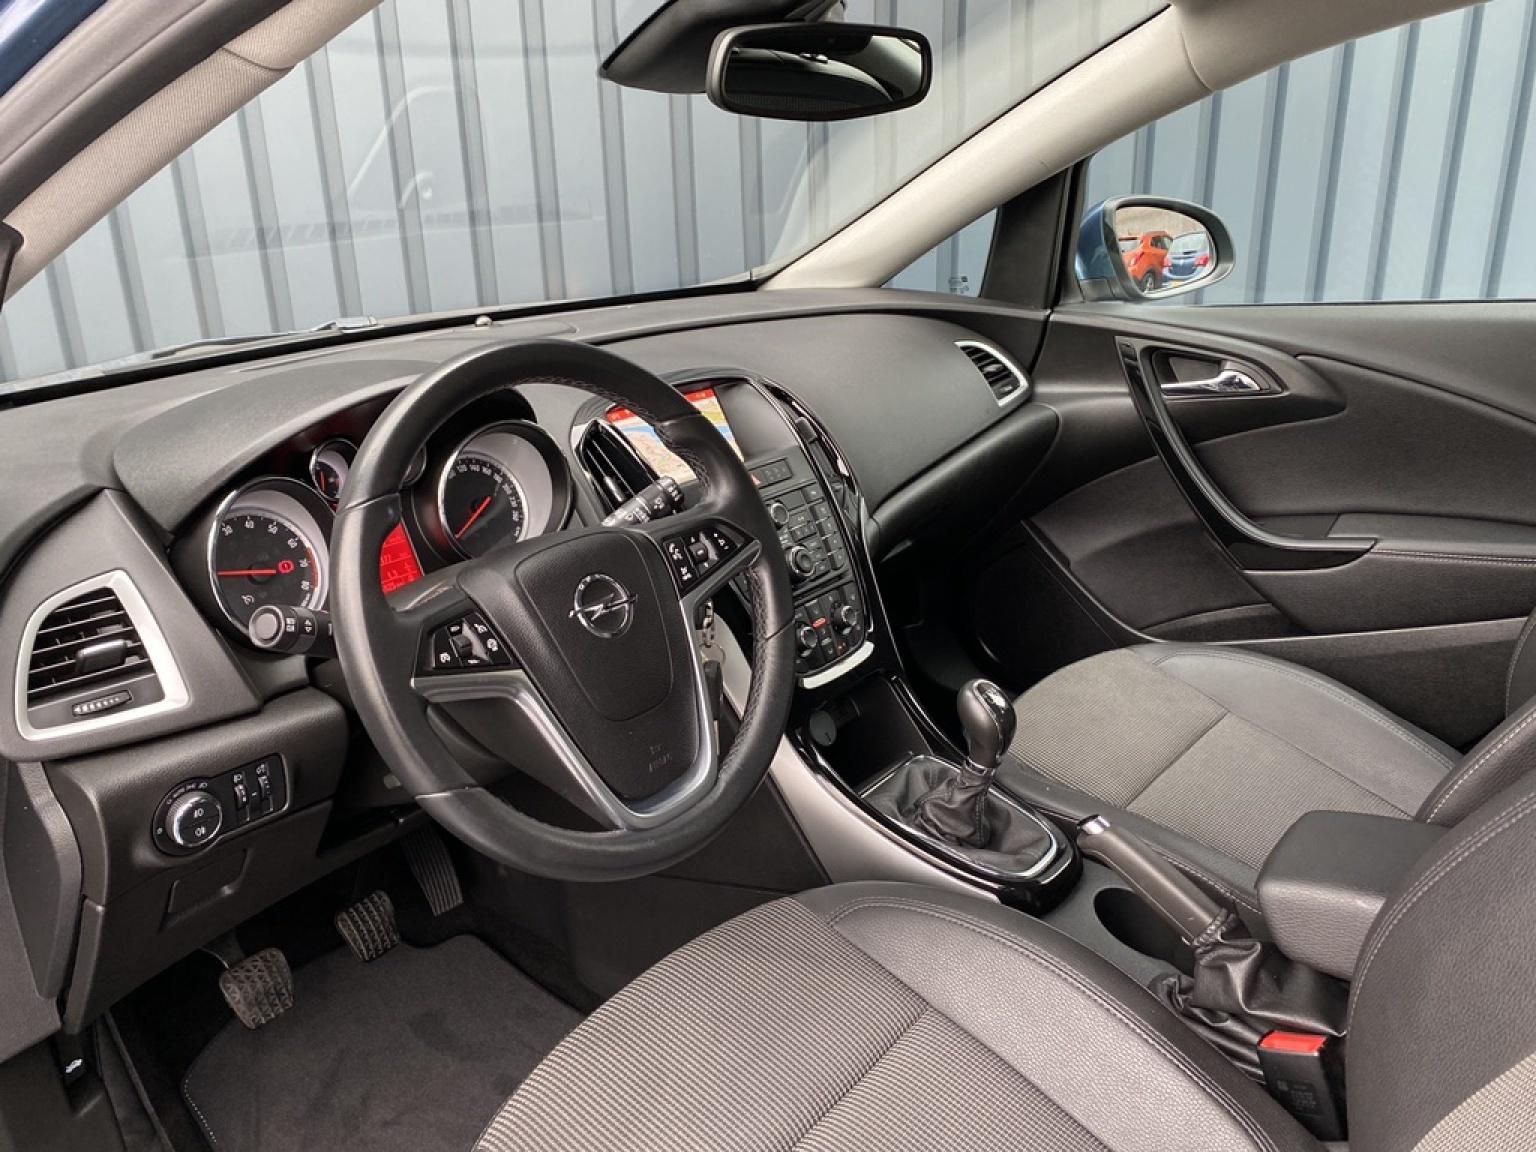 Opel-Astra-22